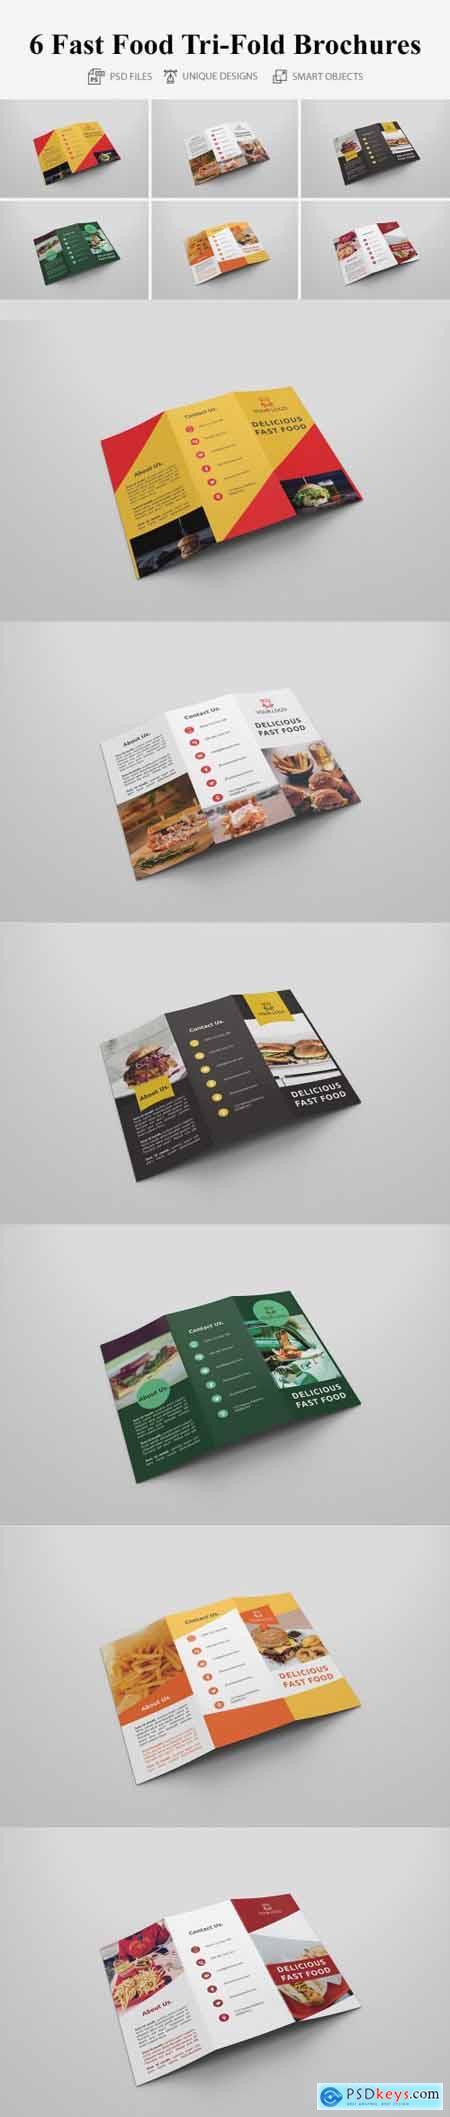 Fast Food Tri-fold Brochures 4273298